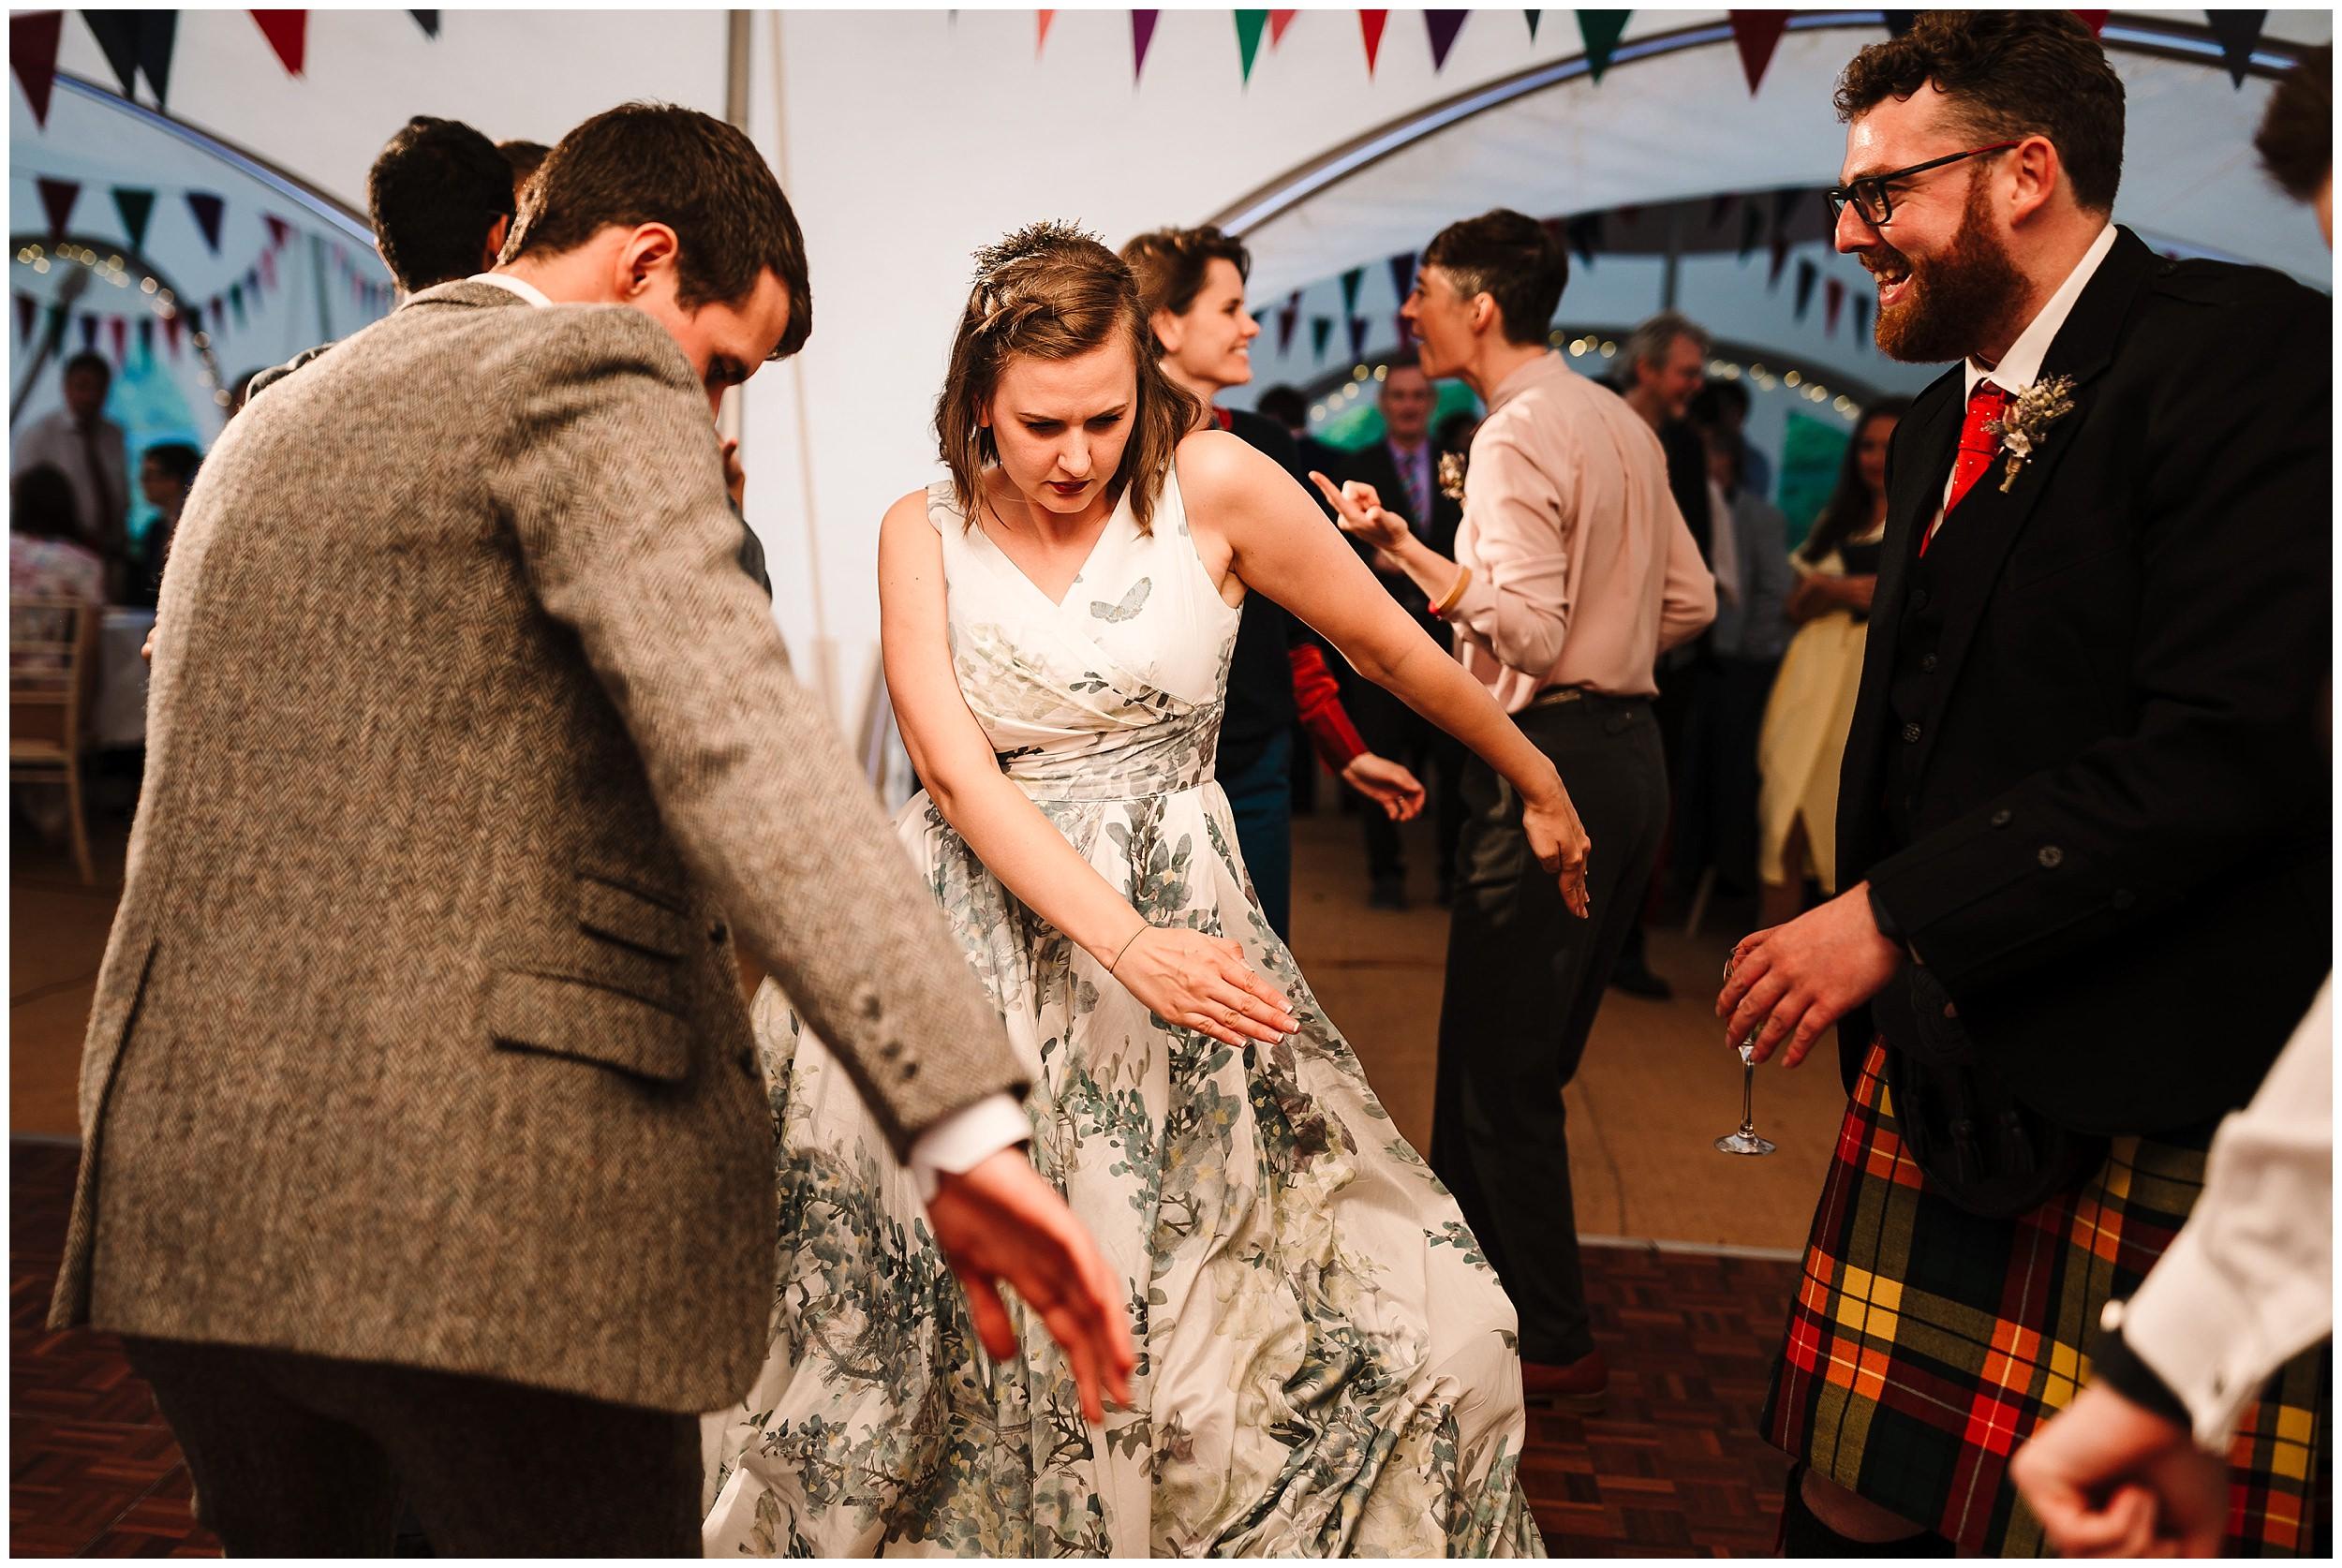 YORKSHIRE OUTDOOR WEDDING PHOTOGRAPHER LUCY ALEX_0039.jpg